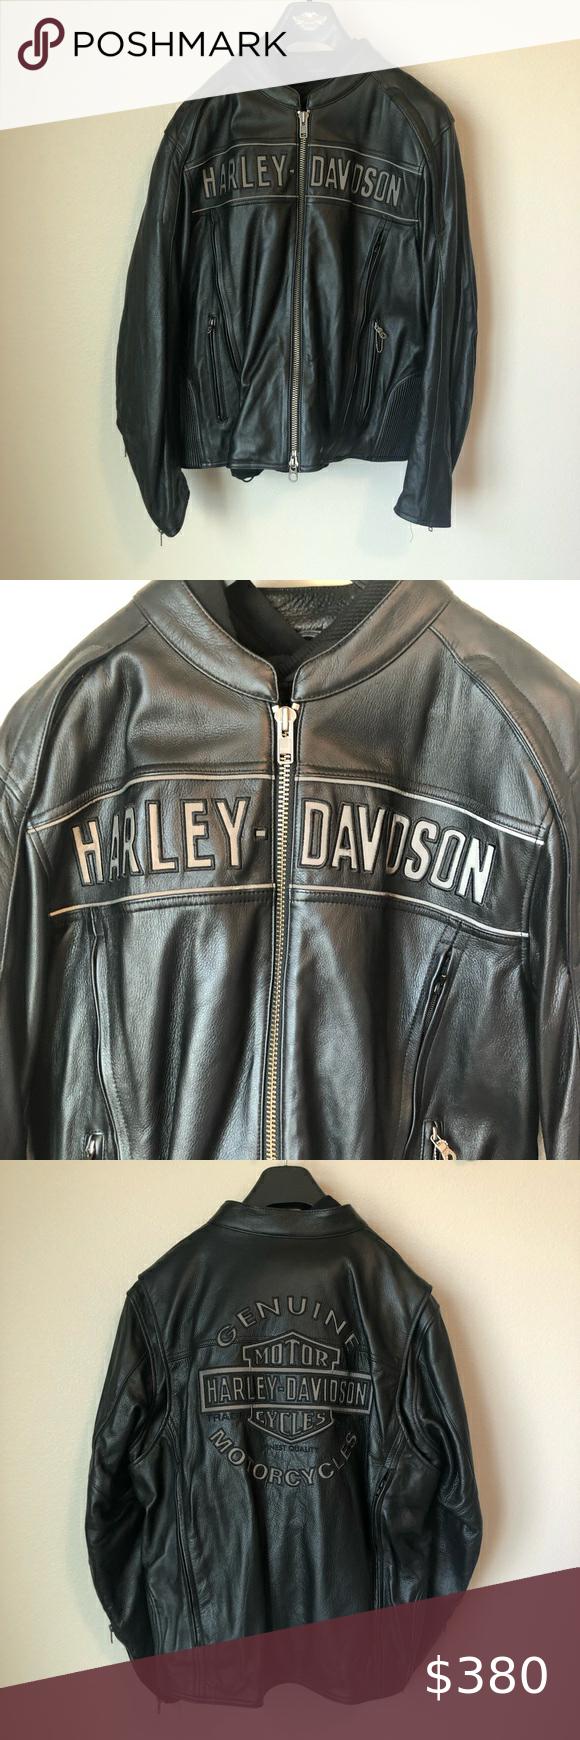 Harley Davidson Leather 3 In 1 Motorcycle Jacket Leather Jacket Harley Davidson Jacket Jackets [ 1740 x 580 Pixel ]